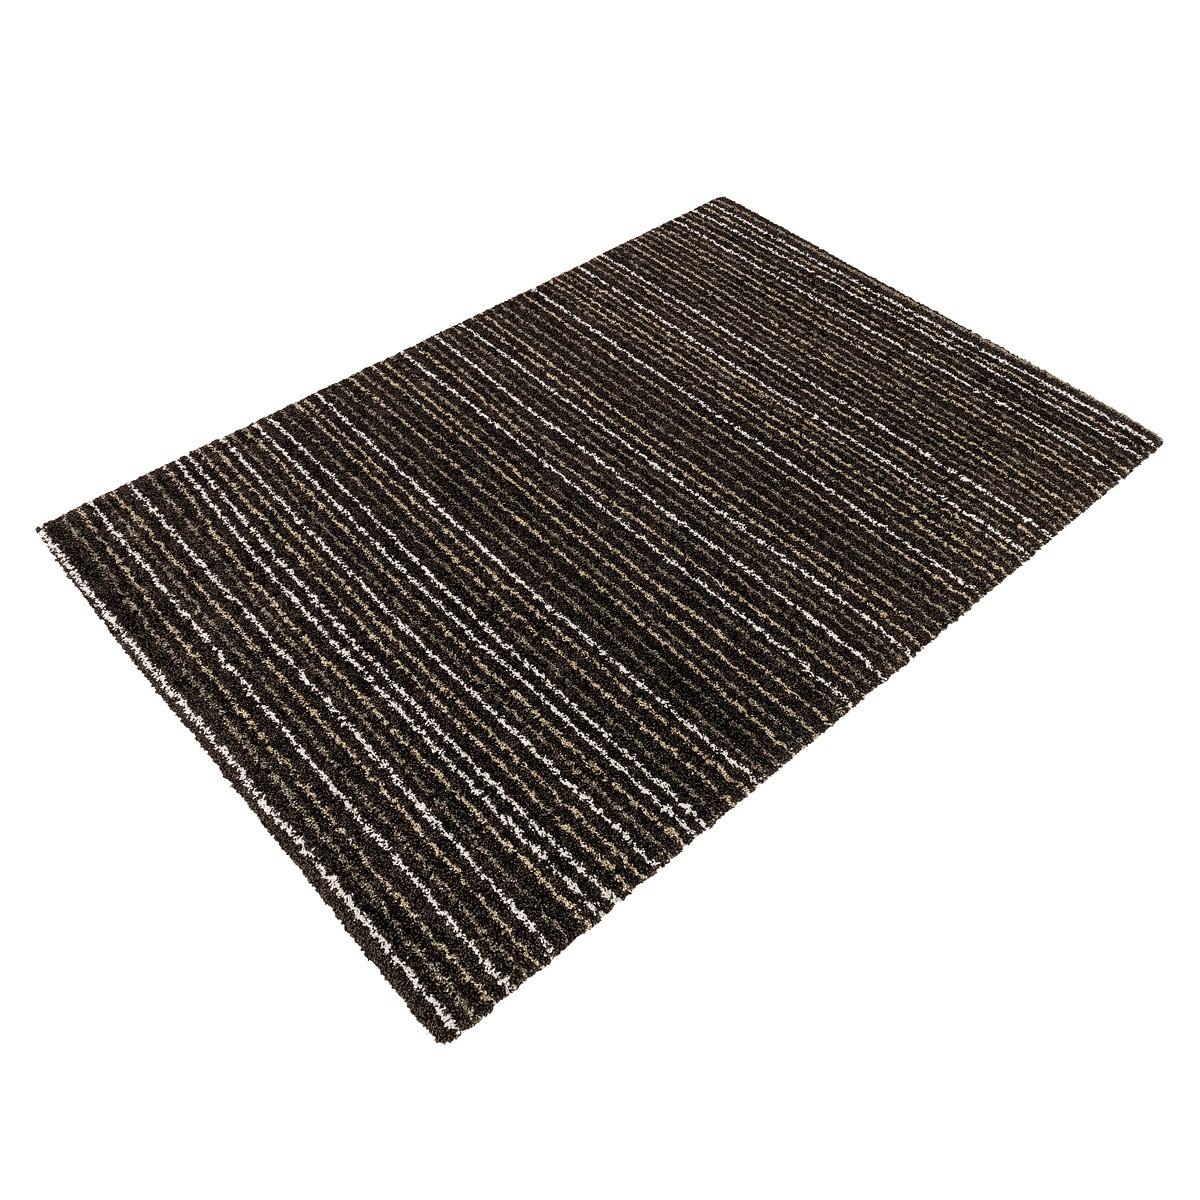 Schöner wohnen carpet maestro design carpet in 4 diff. colours ...